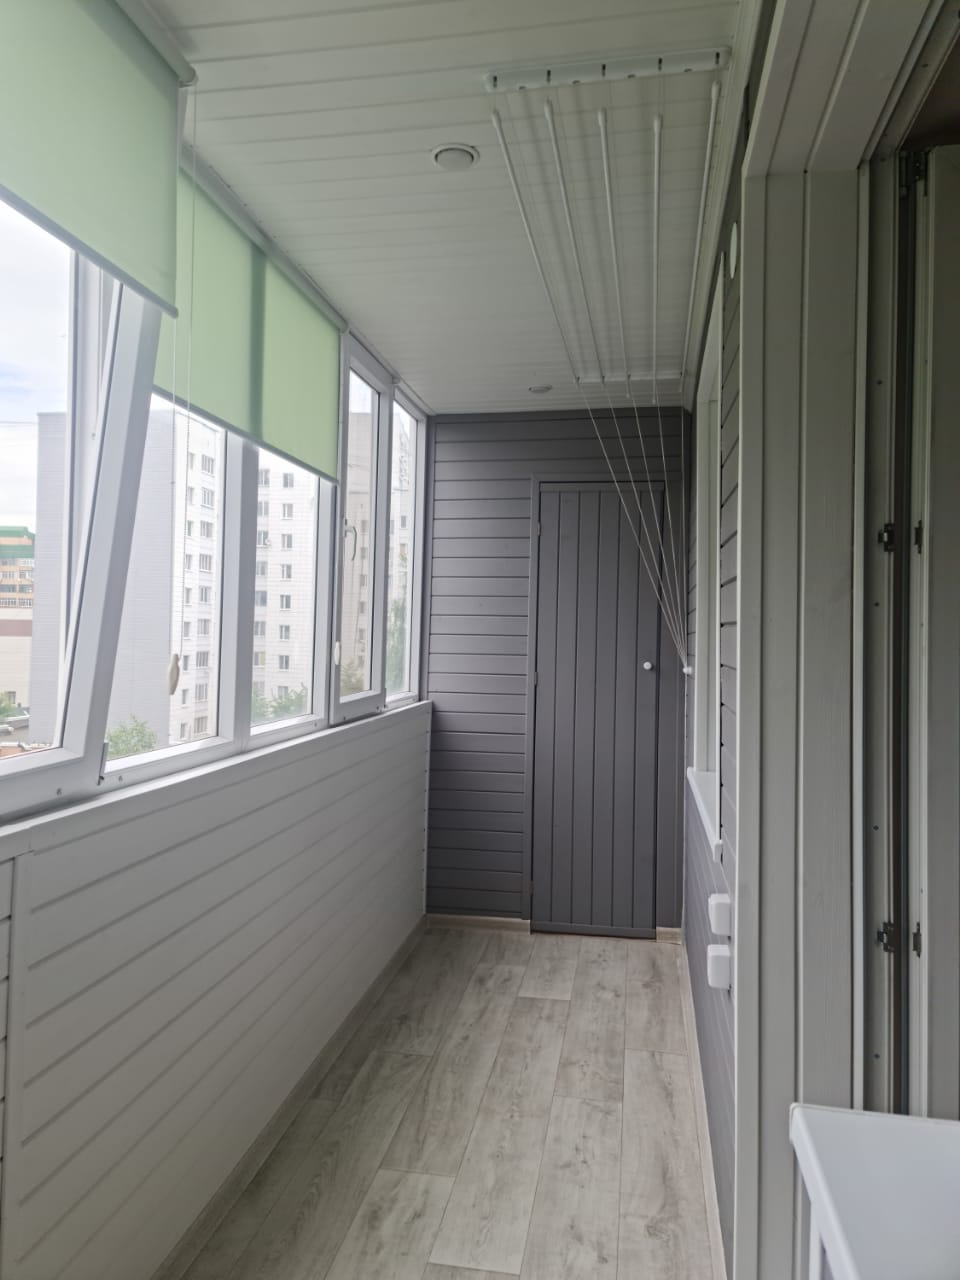 Обшивка лоджии, сборка шкафов, покраска и укладка линолеума ул. Вишневского 10 - фото